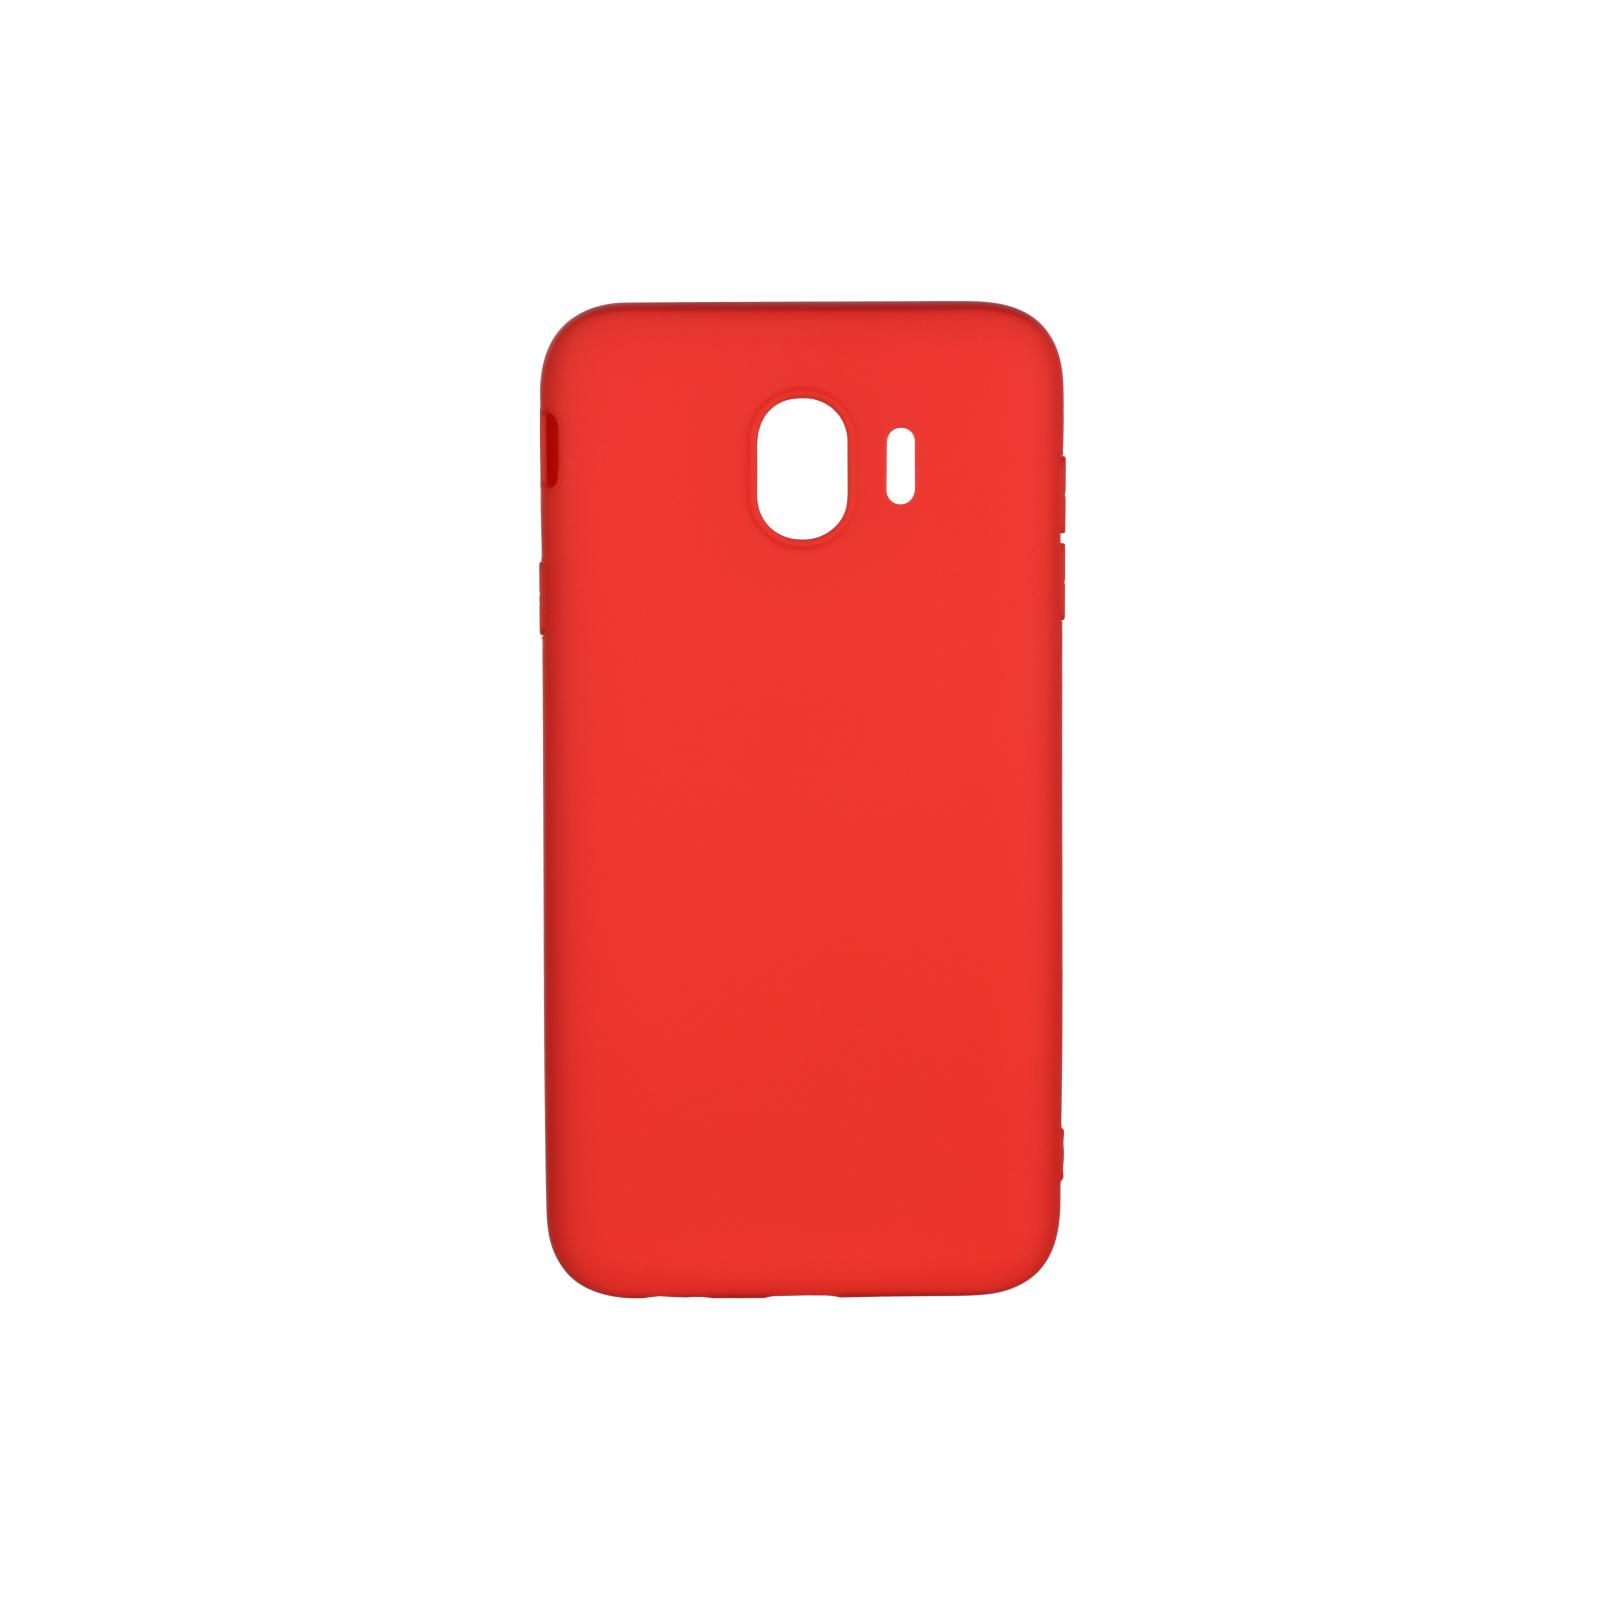 Чохол до моб. телефона 2E Samsung Galaxy J4 2018 (J400) , Soft touch, Red (2E-G-J4-18-NKST-RD)